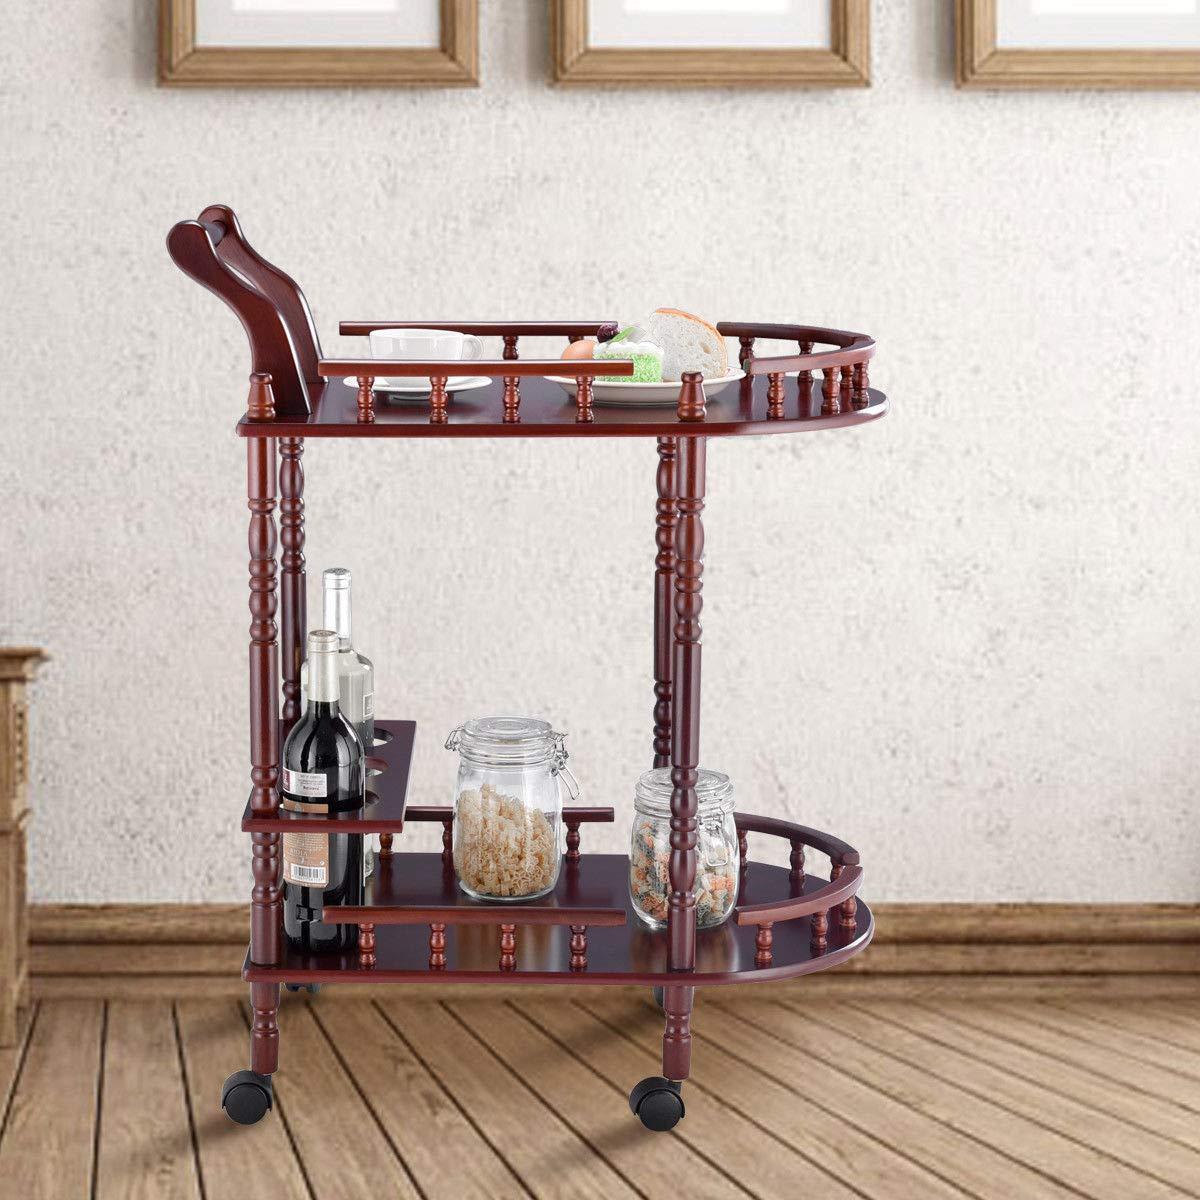 Eosphor US Rolling Serving Trolley Cart Bar Cart Trolley Two-Tier Rack Rolling Wine Rack Hotel Cherry Wood by Eosphor US (Image #6)